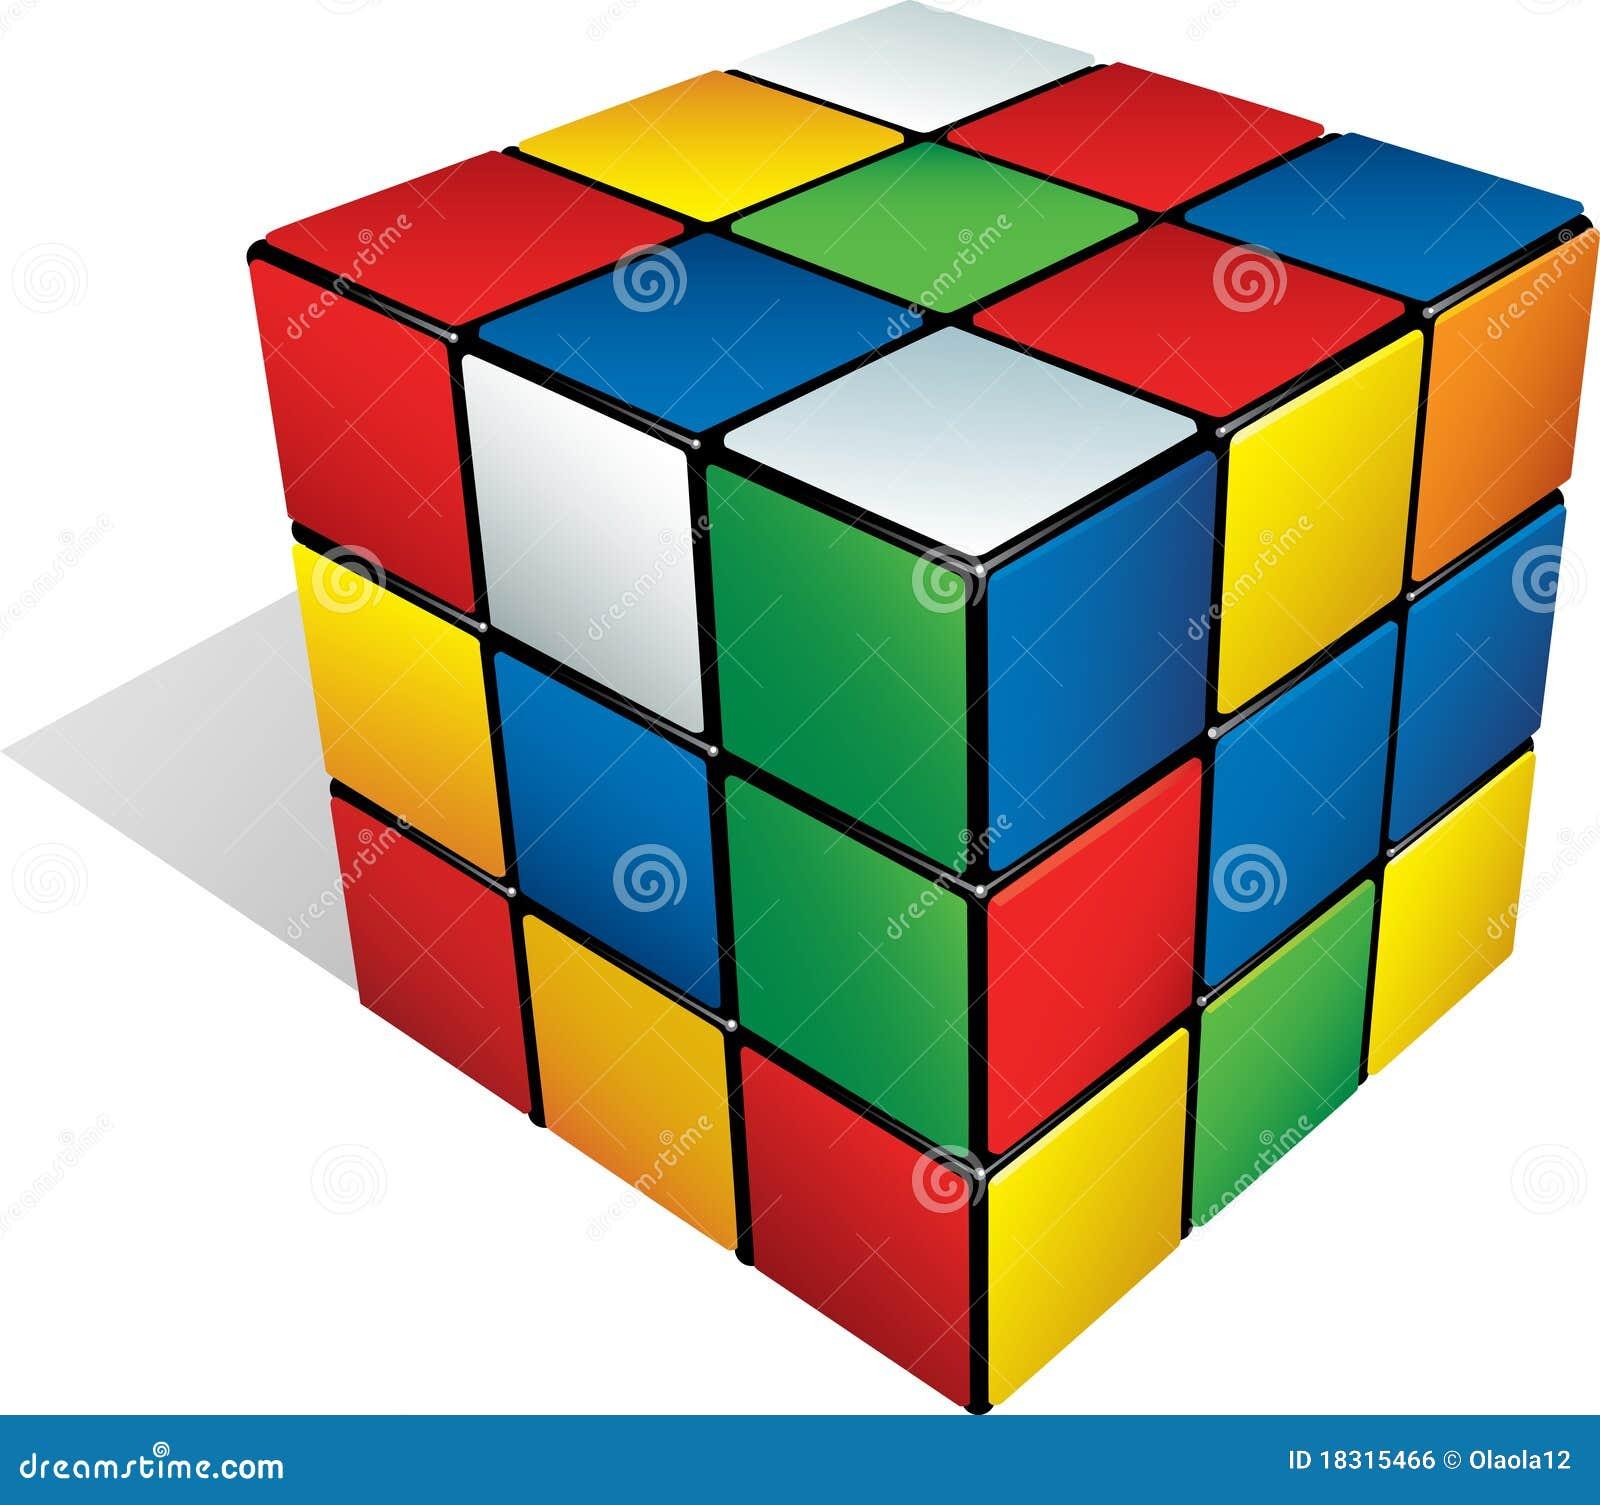 Rectangular Prism Real Life Examples: Cubo 3d Multicolore Fotografia Editoriale